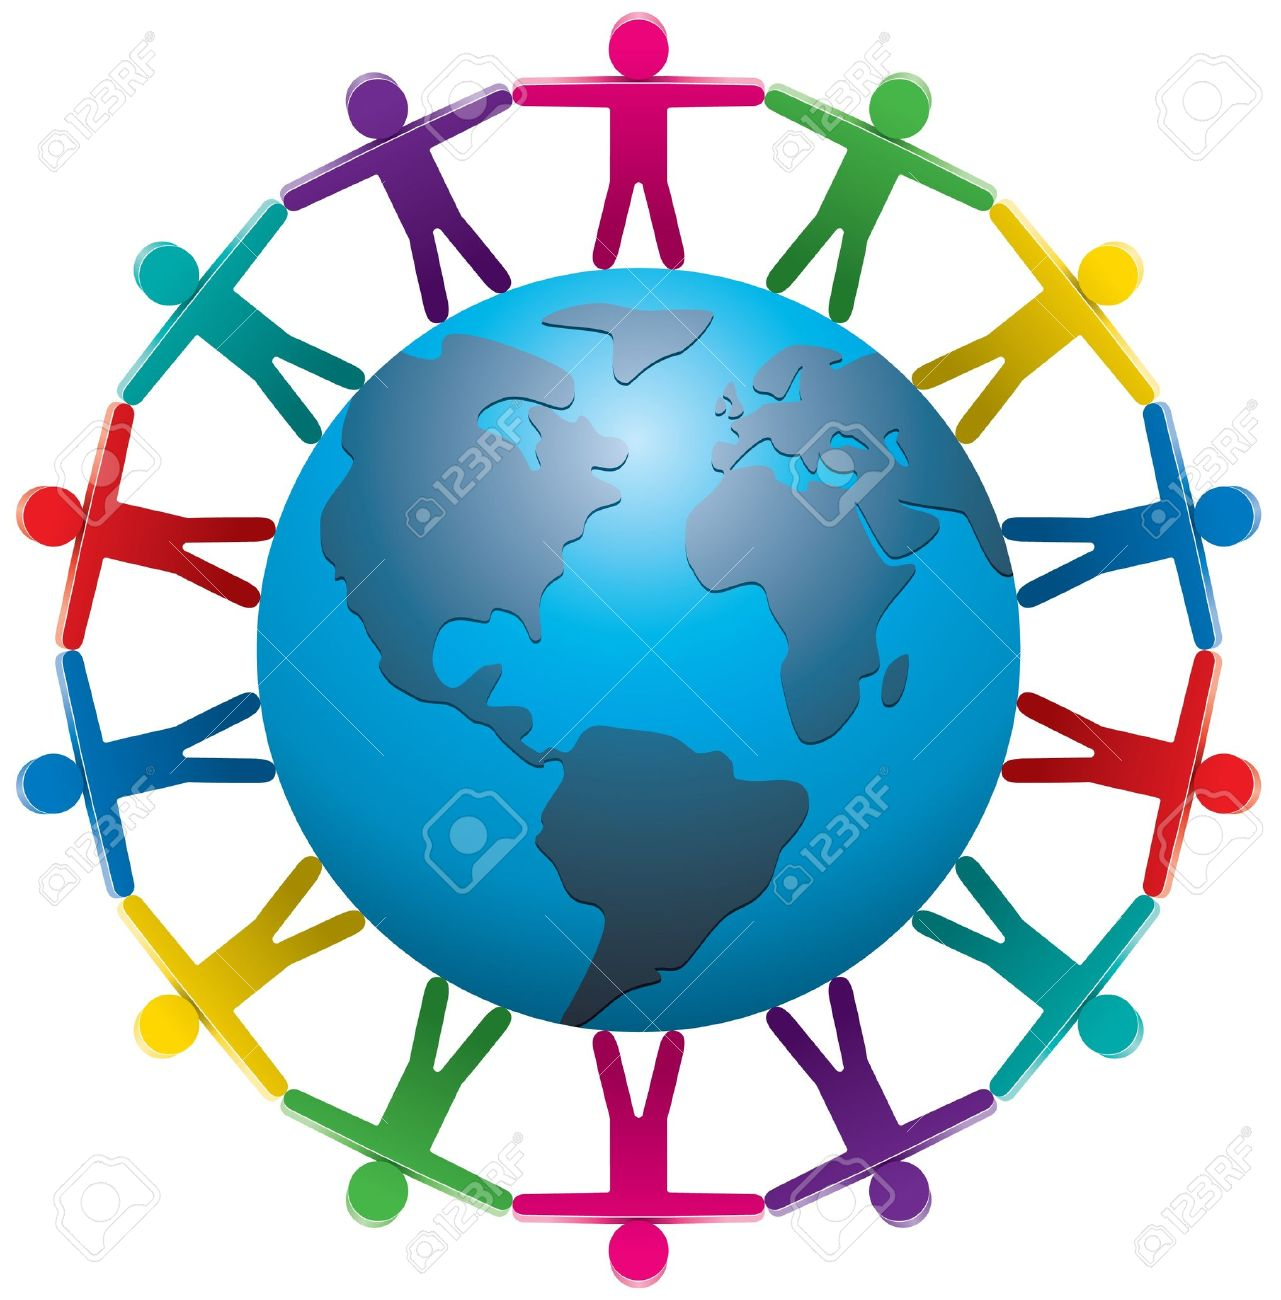 illustration of people around the world - 10190605